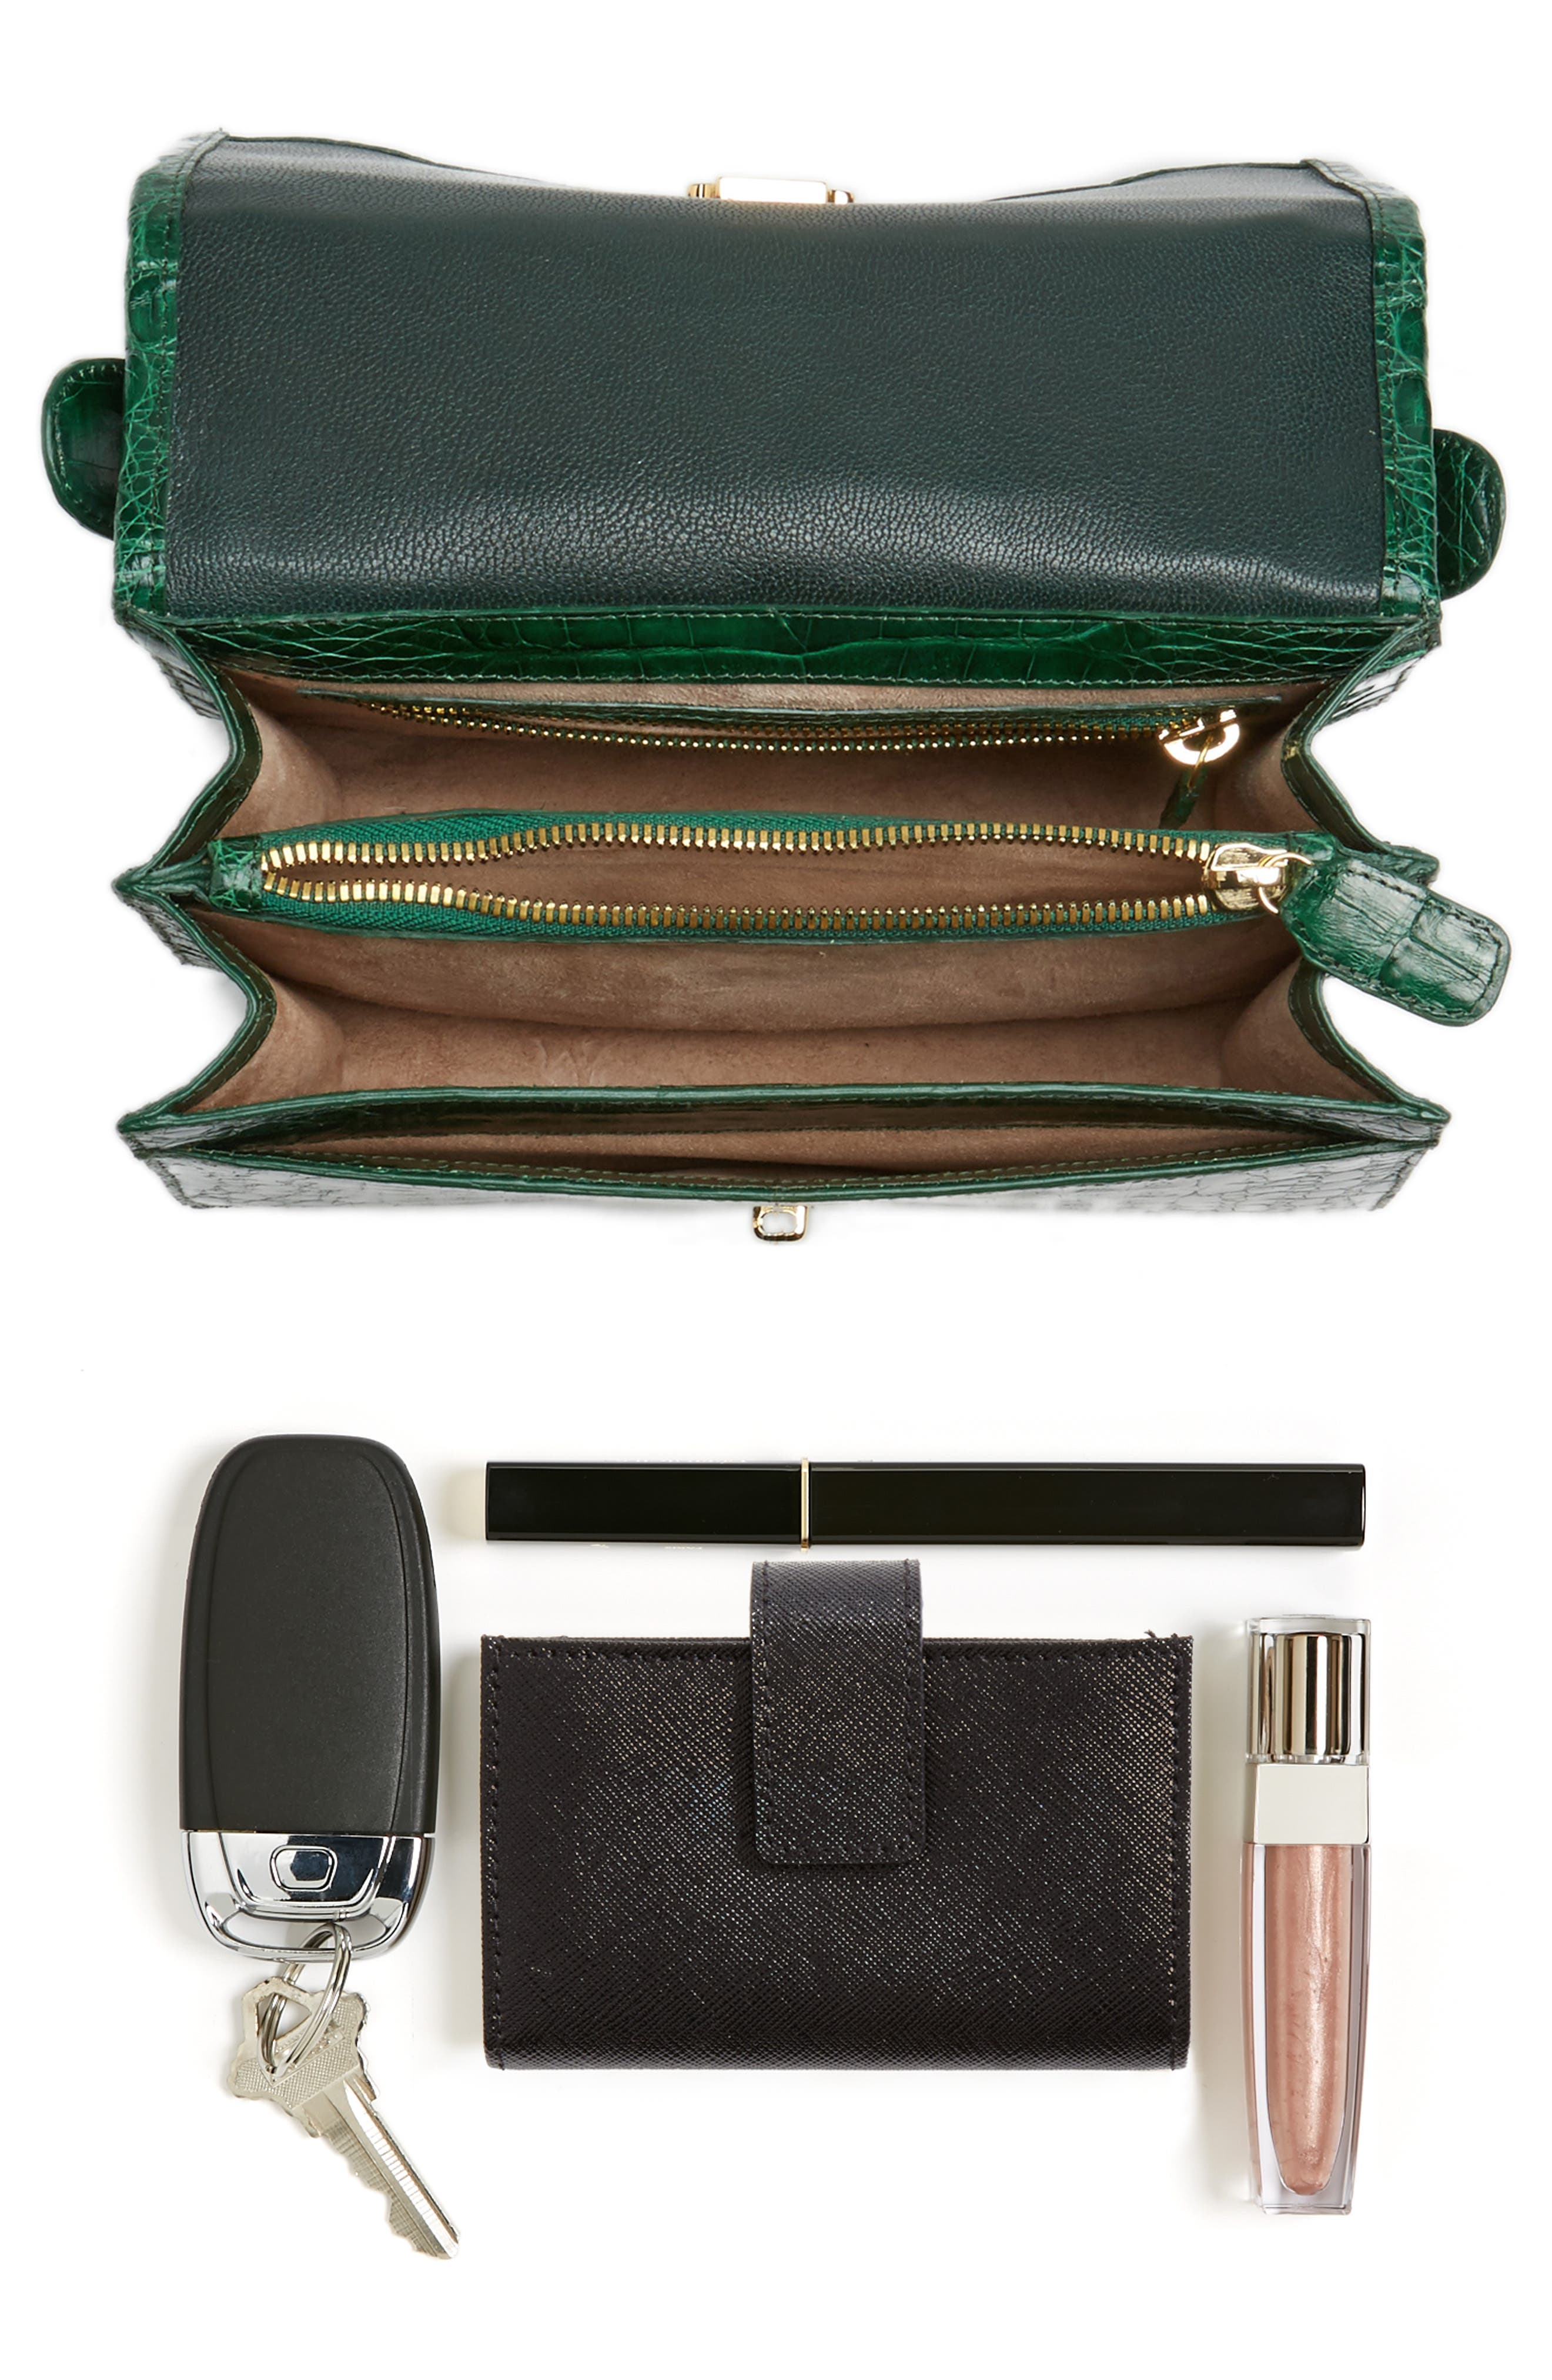 Divino Genuine Crocodile Top Handle Bag,                             Alternate thumbnail 7, color,                             KELLY GREEN SHINY